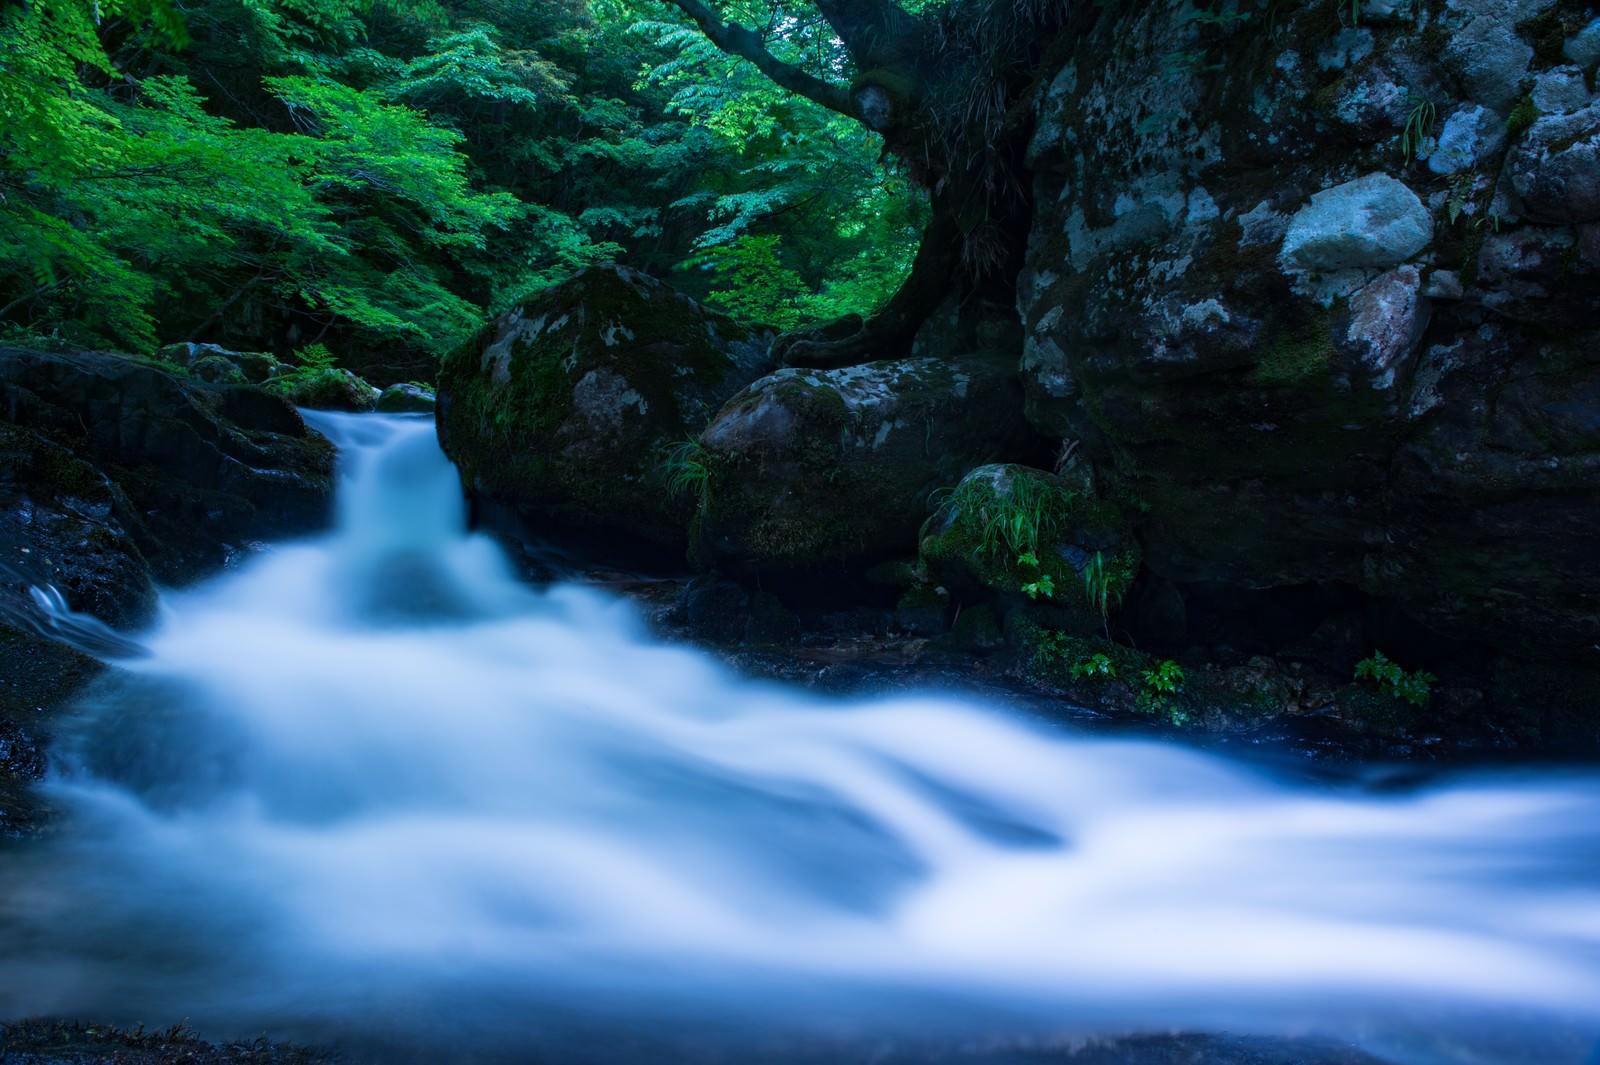 「白賀渓谷の水流(岡山県鏡野町)」の写真